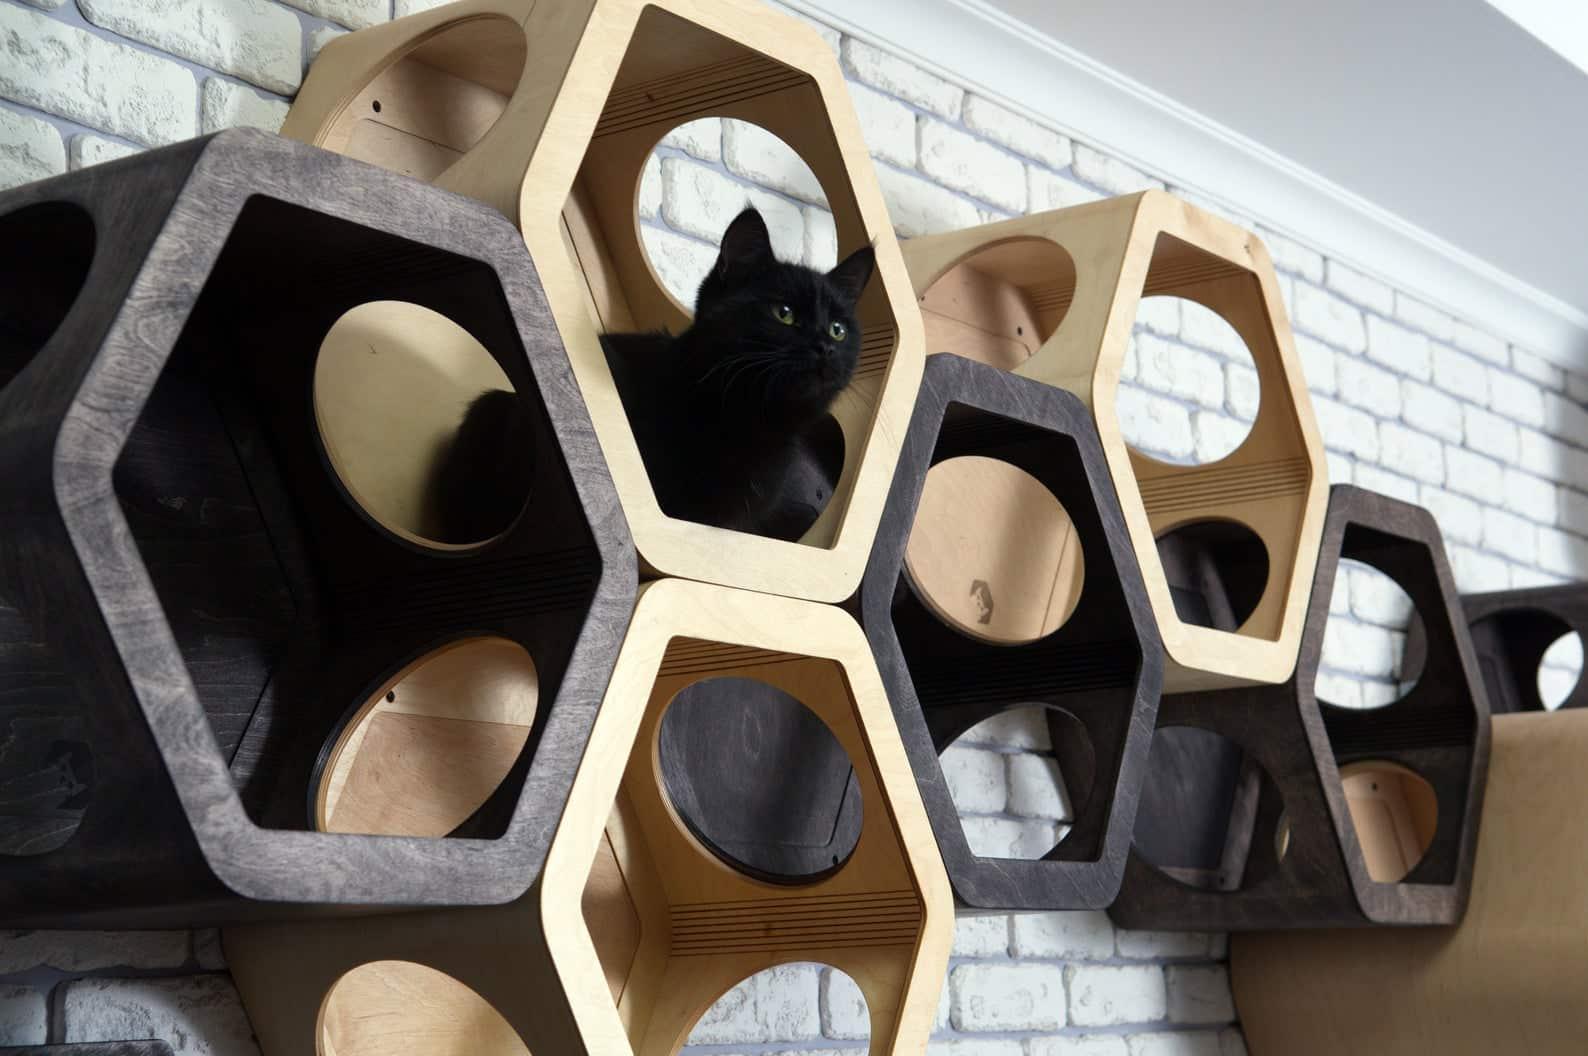 arbre a chat mural design hexagone bloc